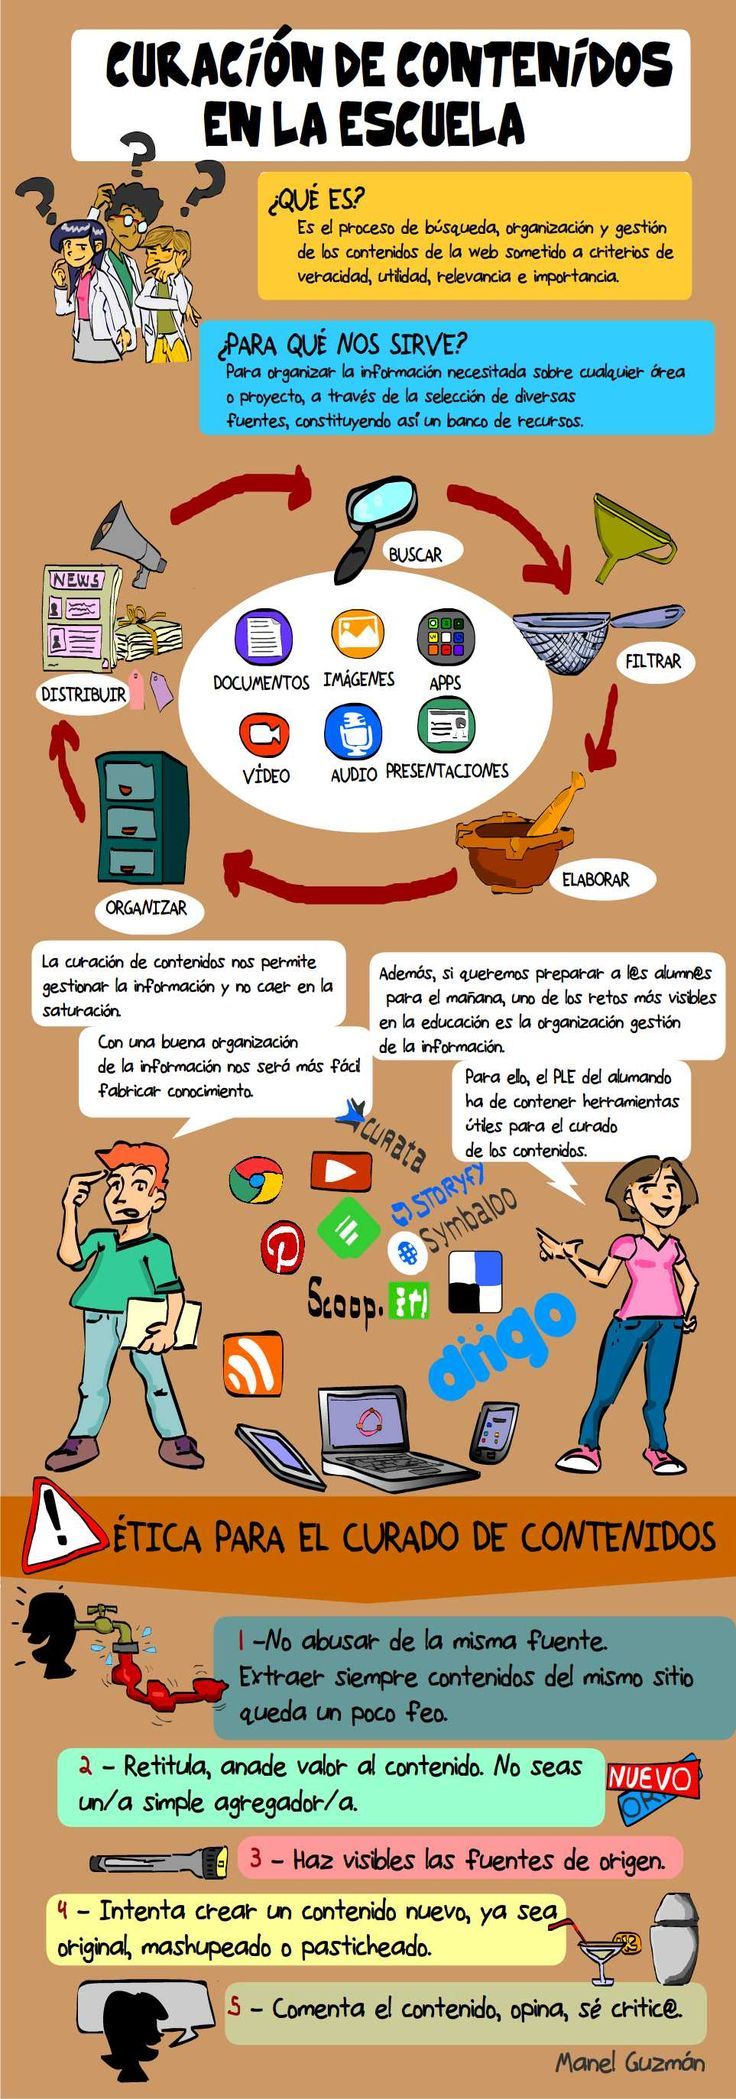 Curación de contenidos para la escuela. #infografia #infographic #socialmedia #education